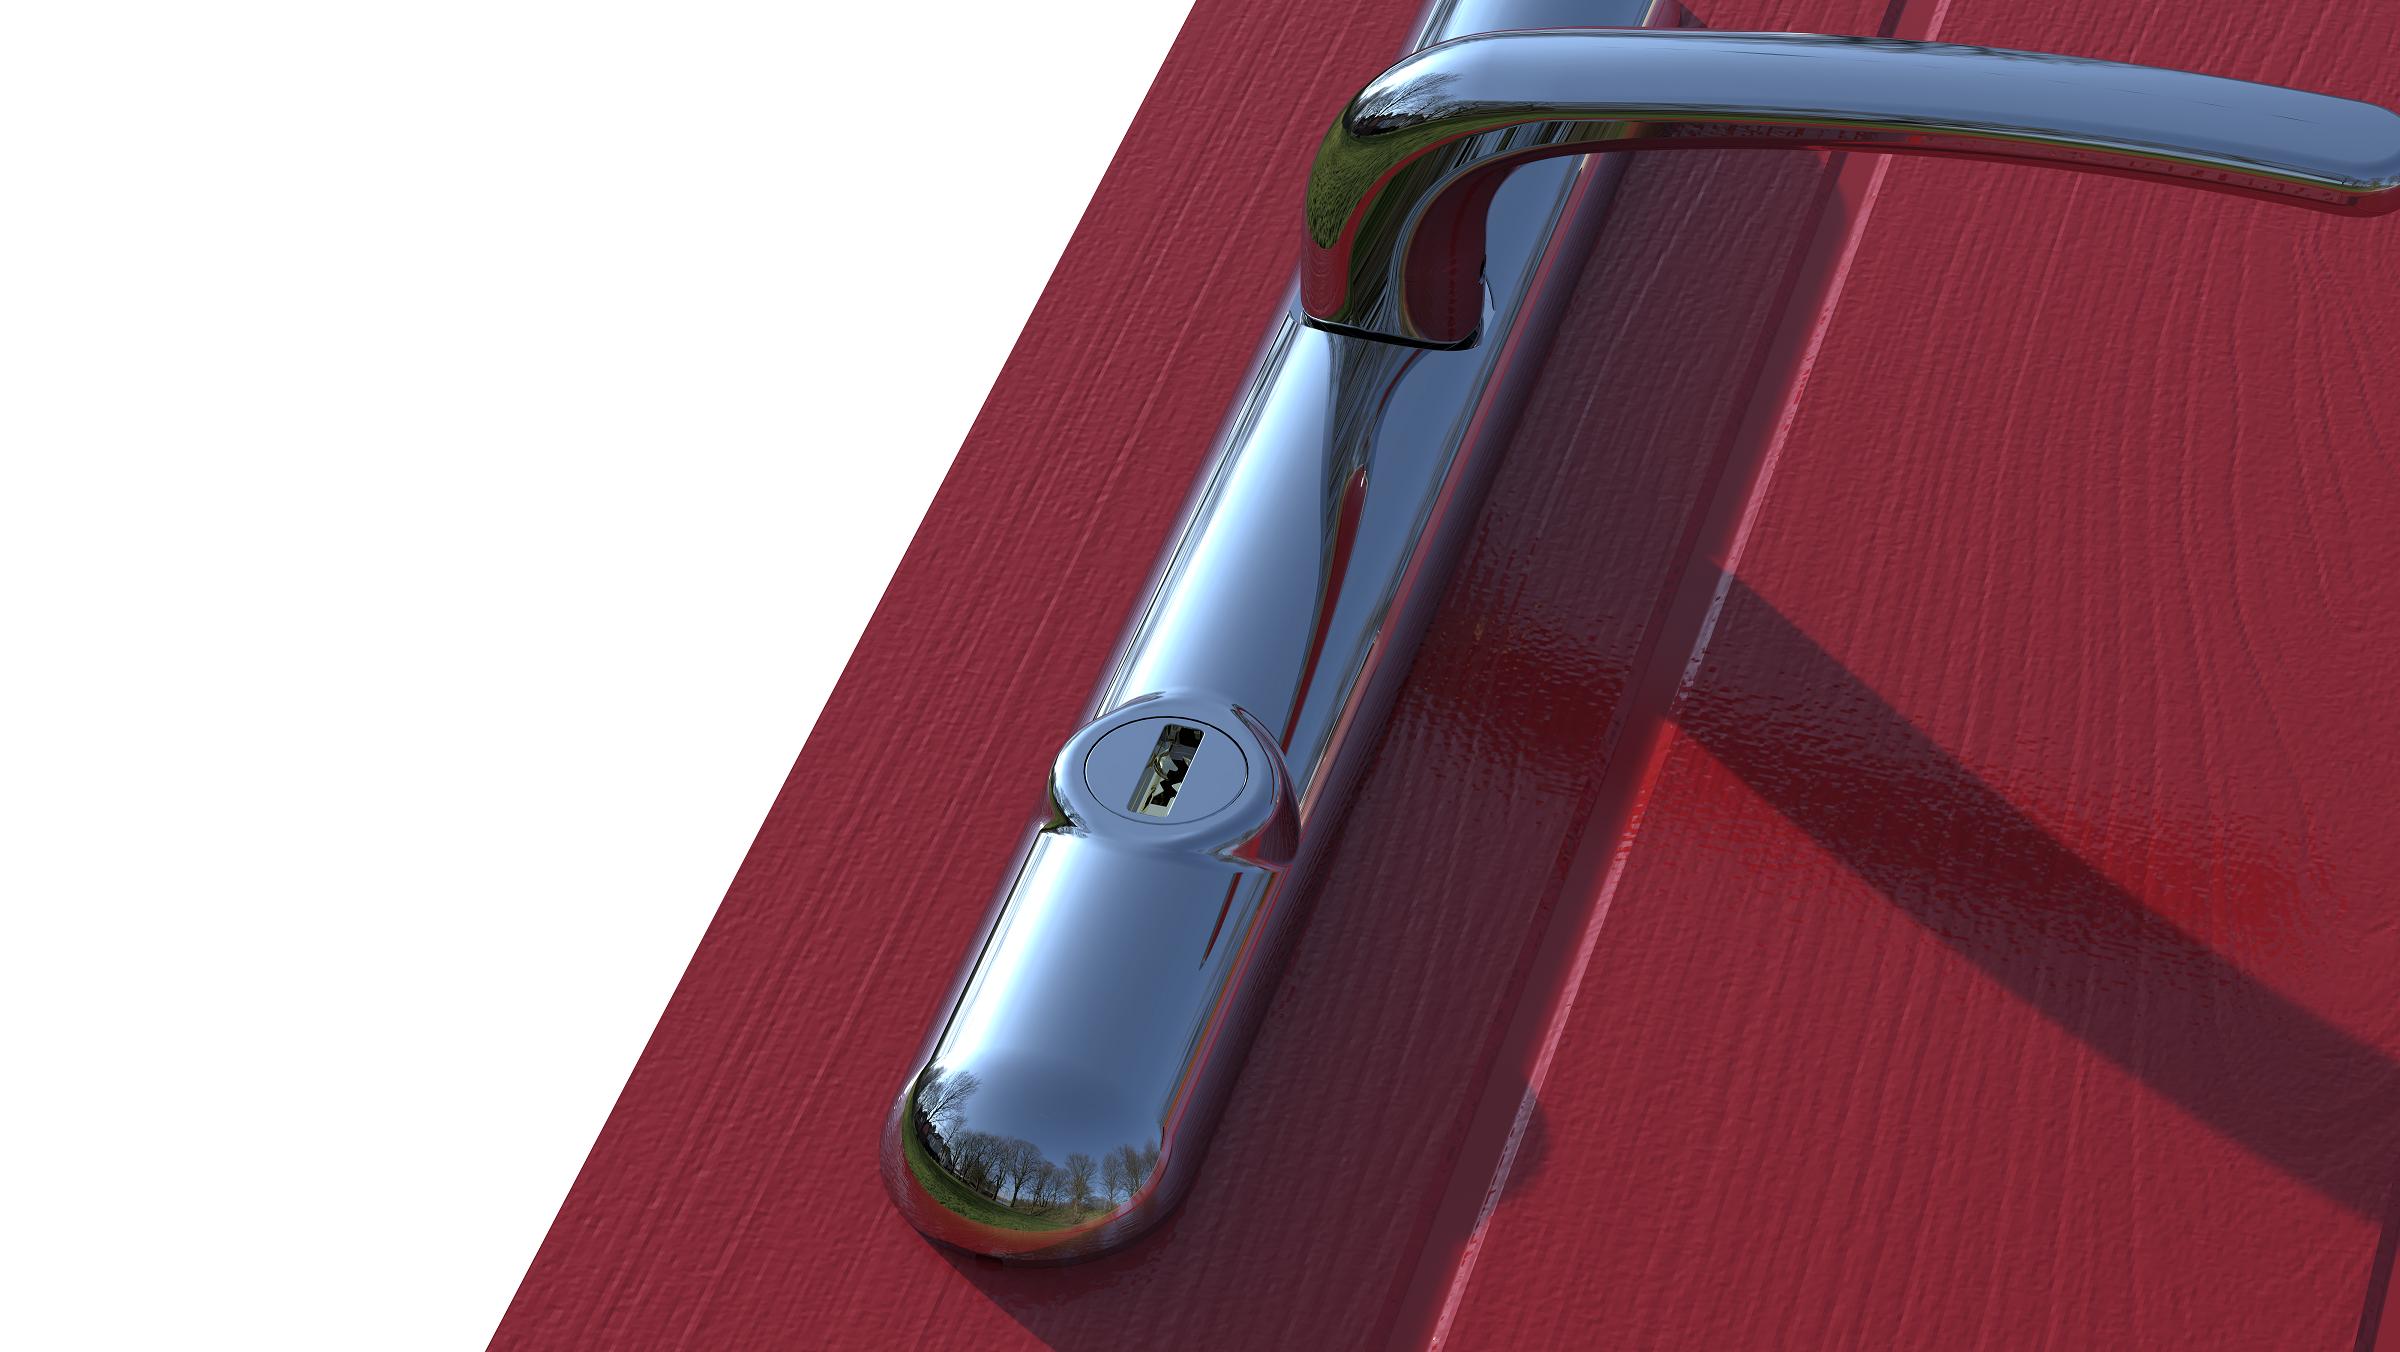 Ultion handle